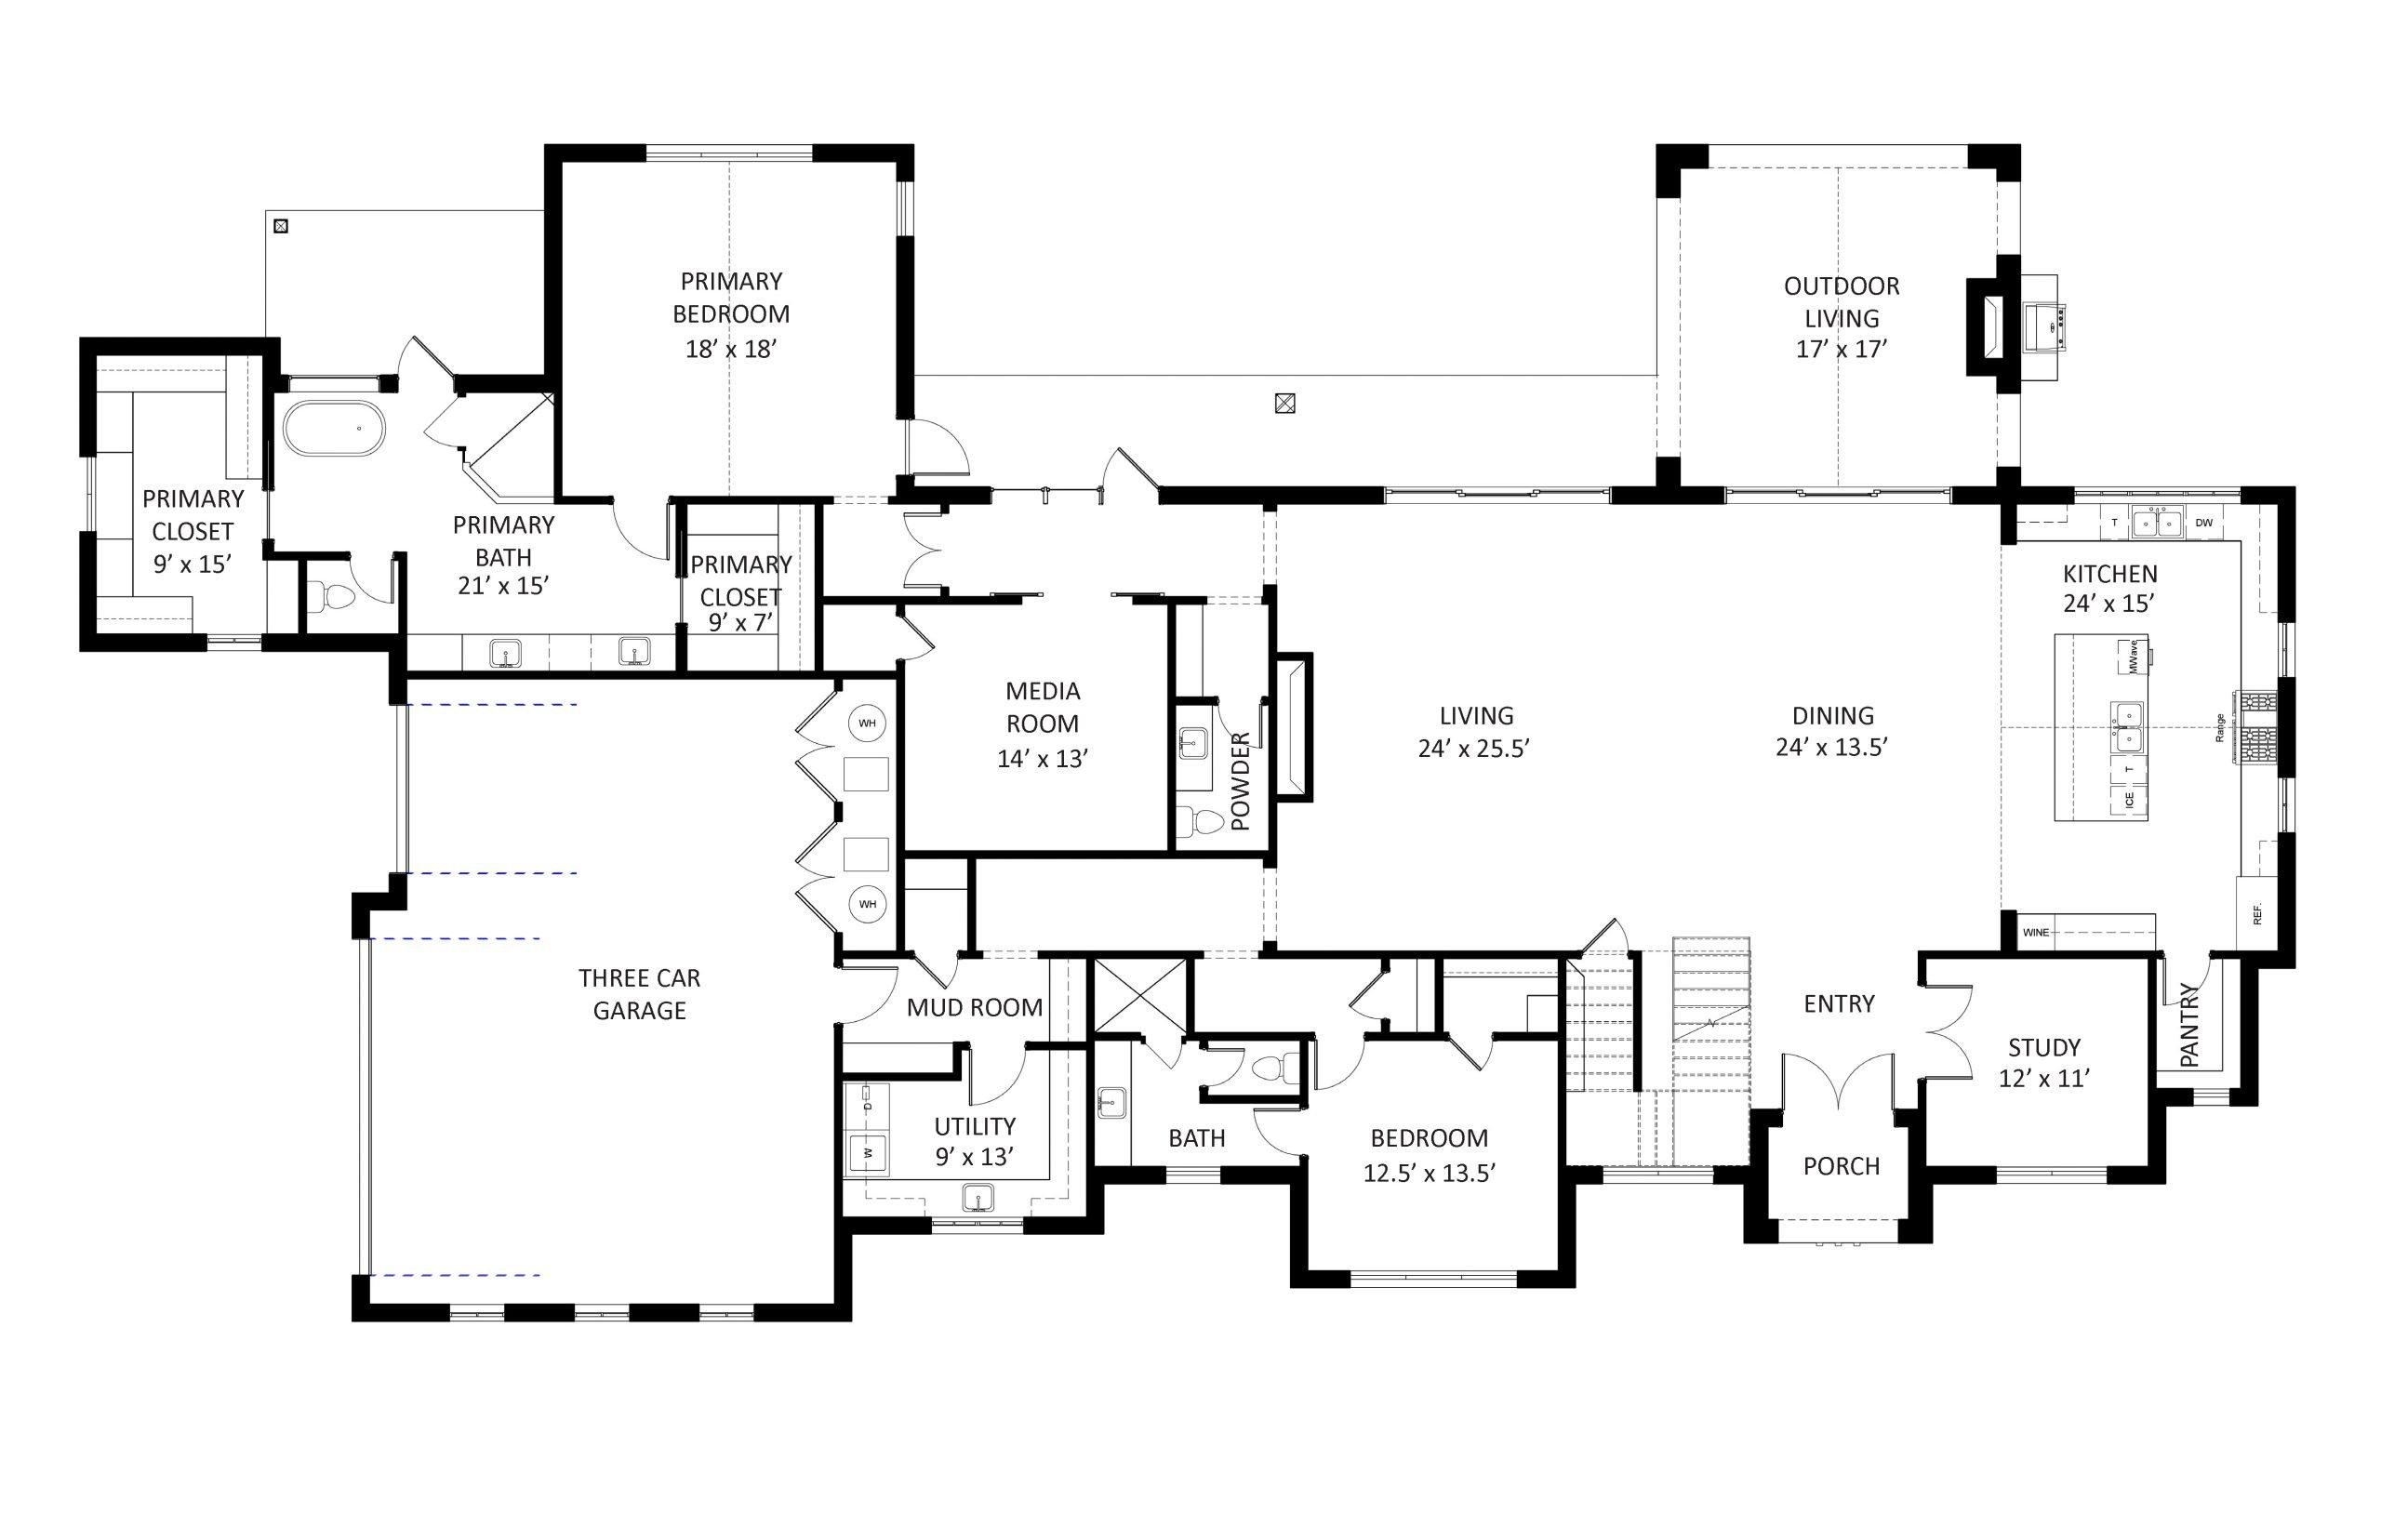 9617 Lakeway Run Floor Plans_Page_1